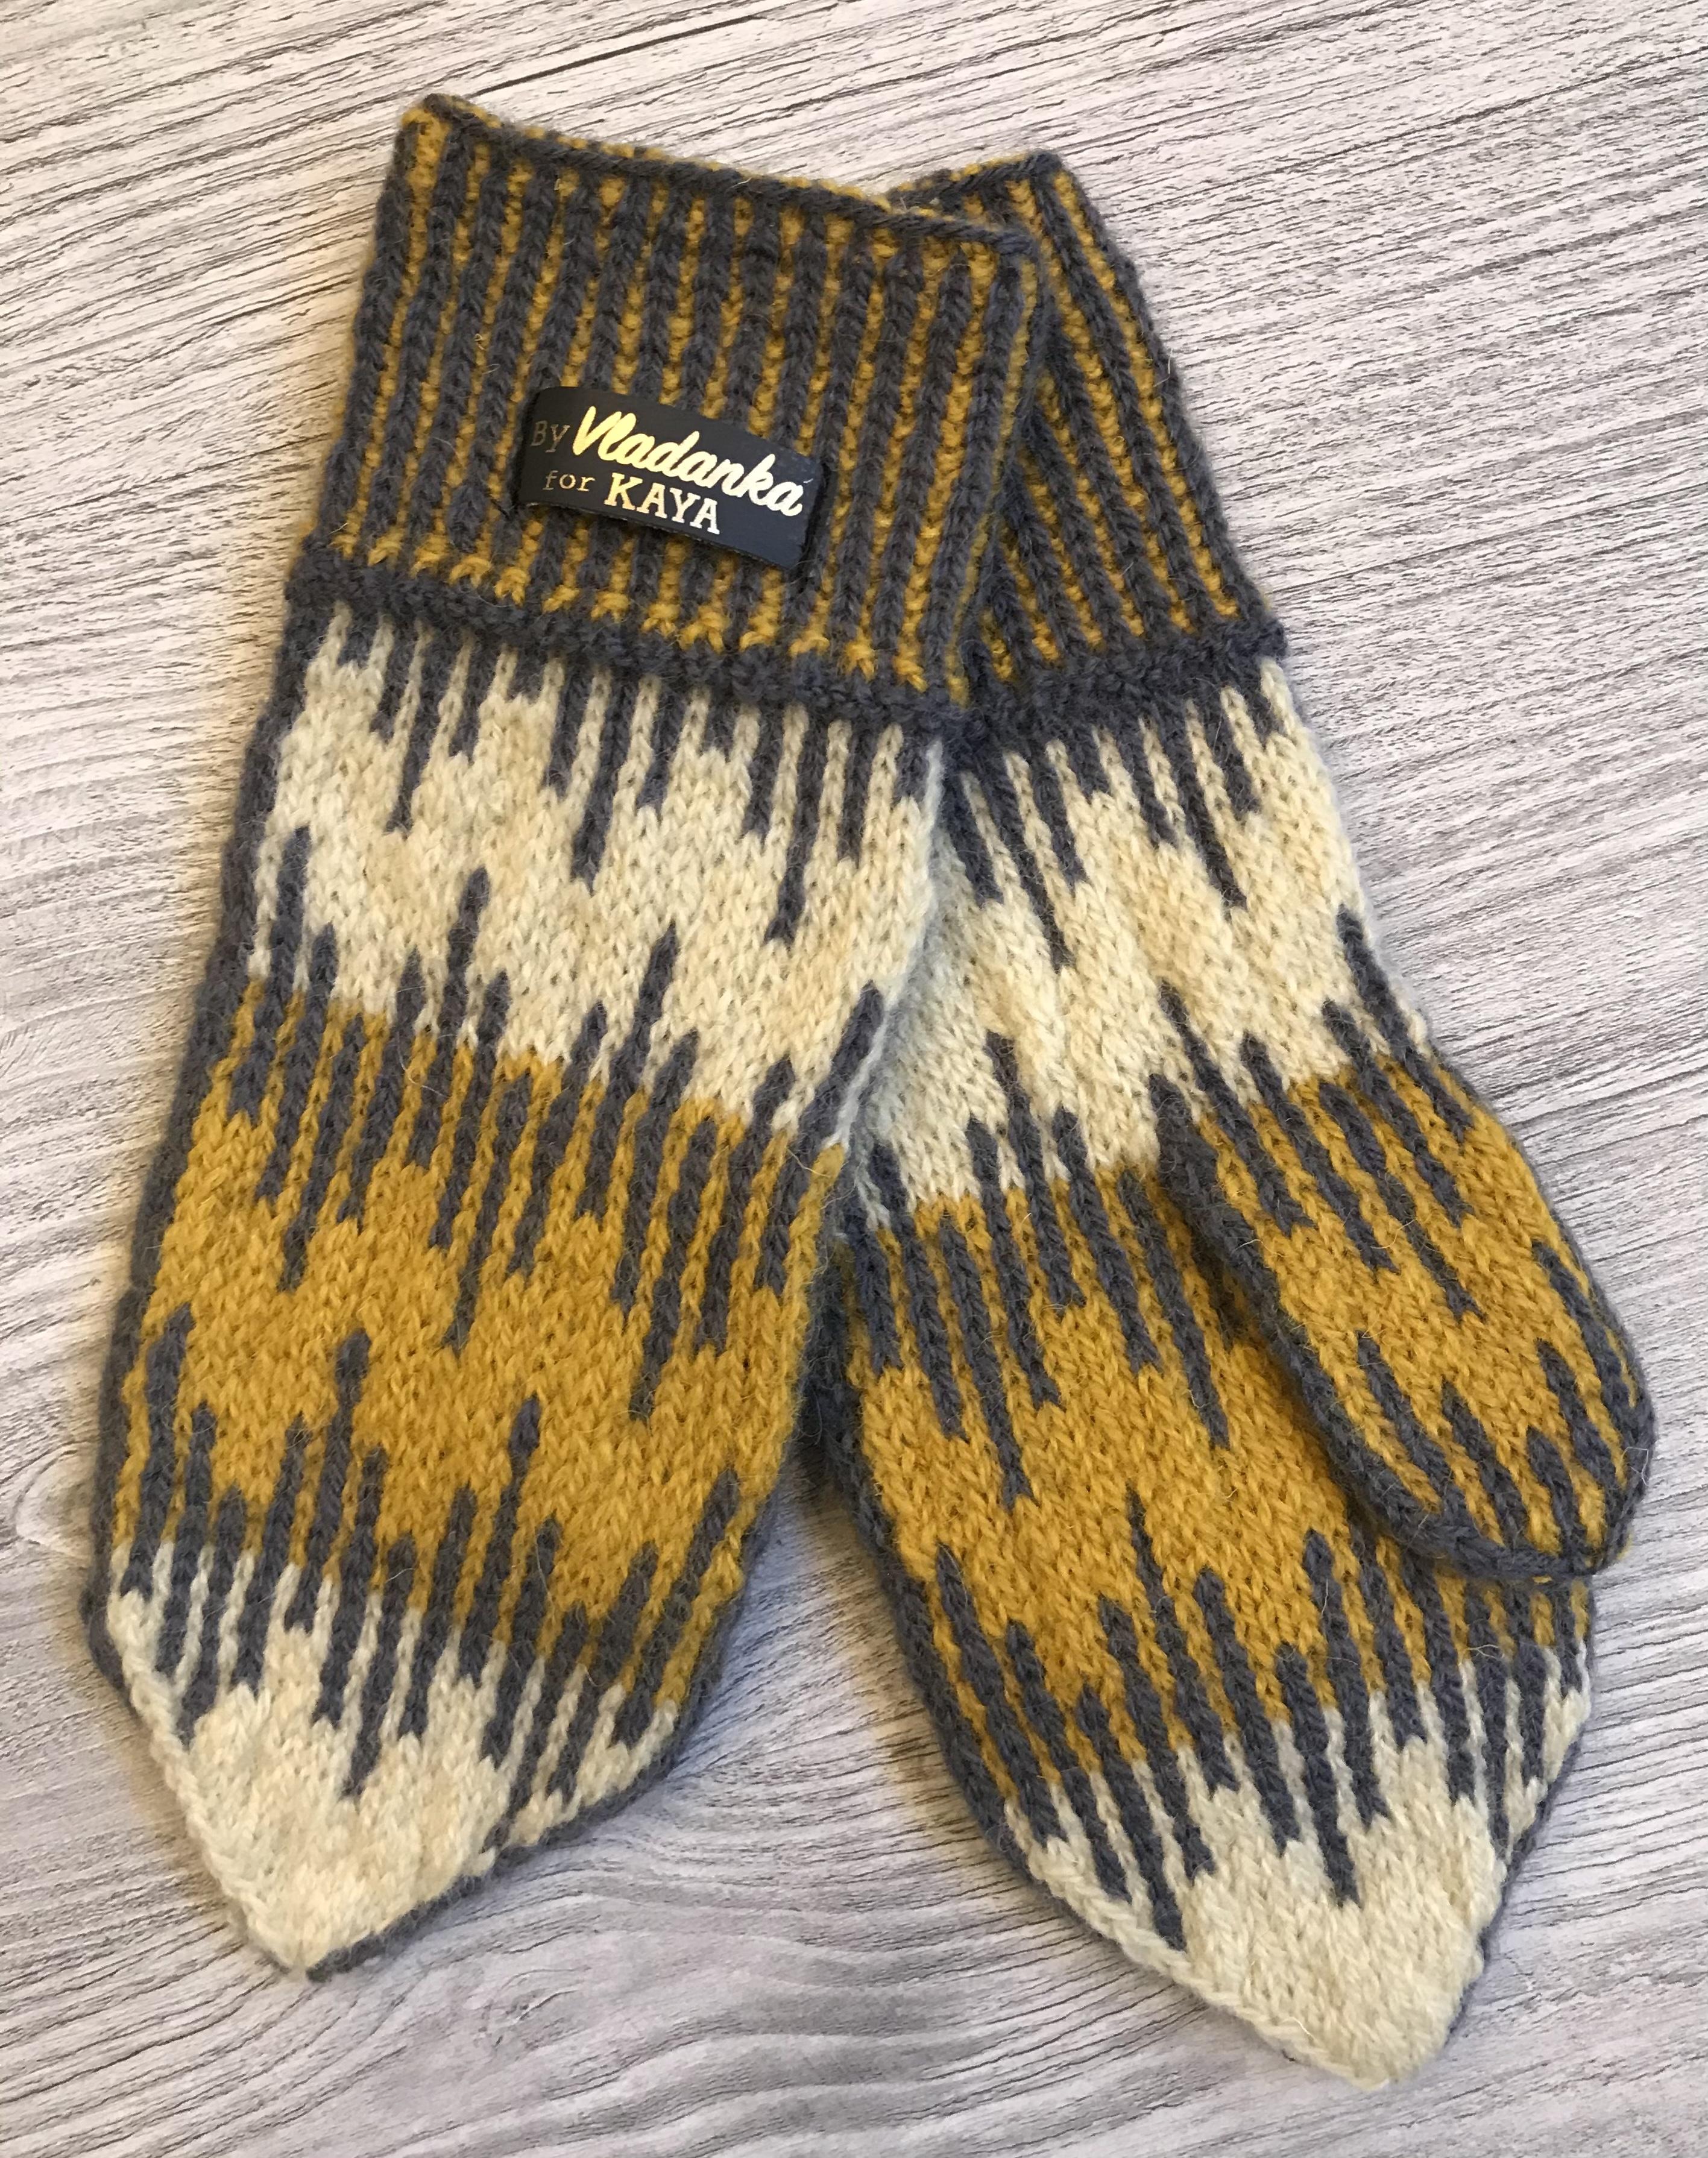 Hand-knitted organic mittens by Vladanka for Kaya Originals